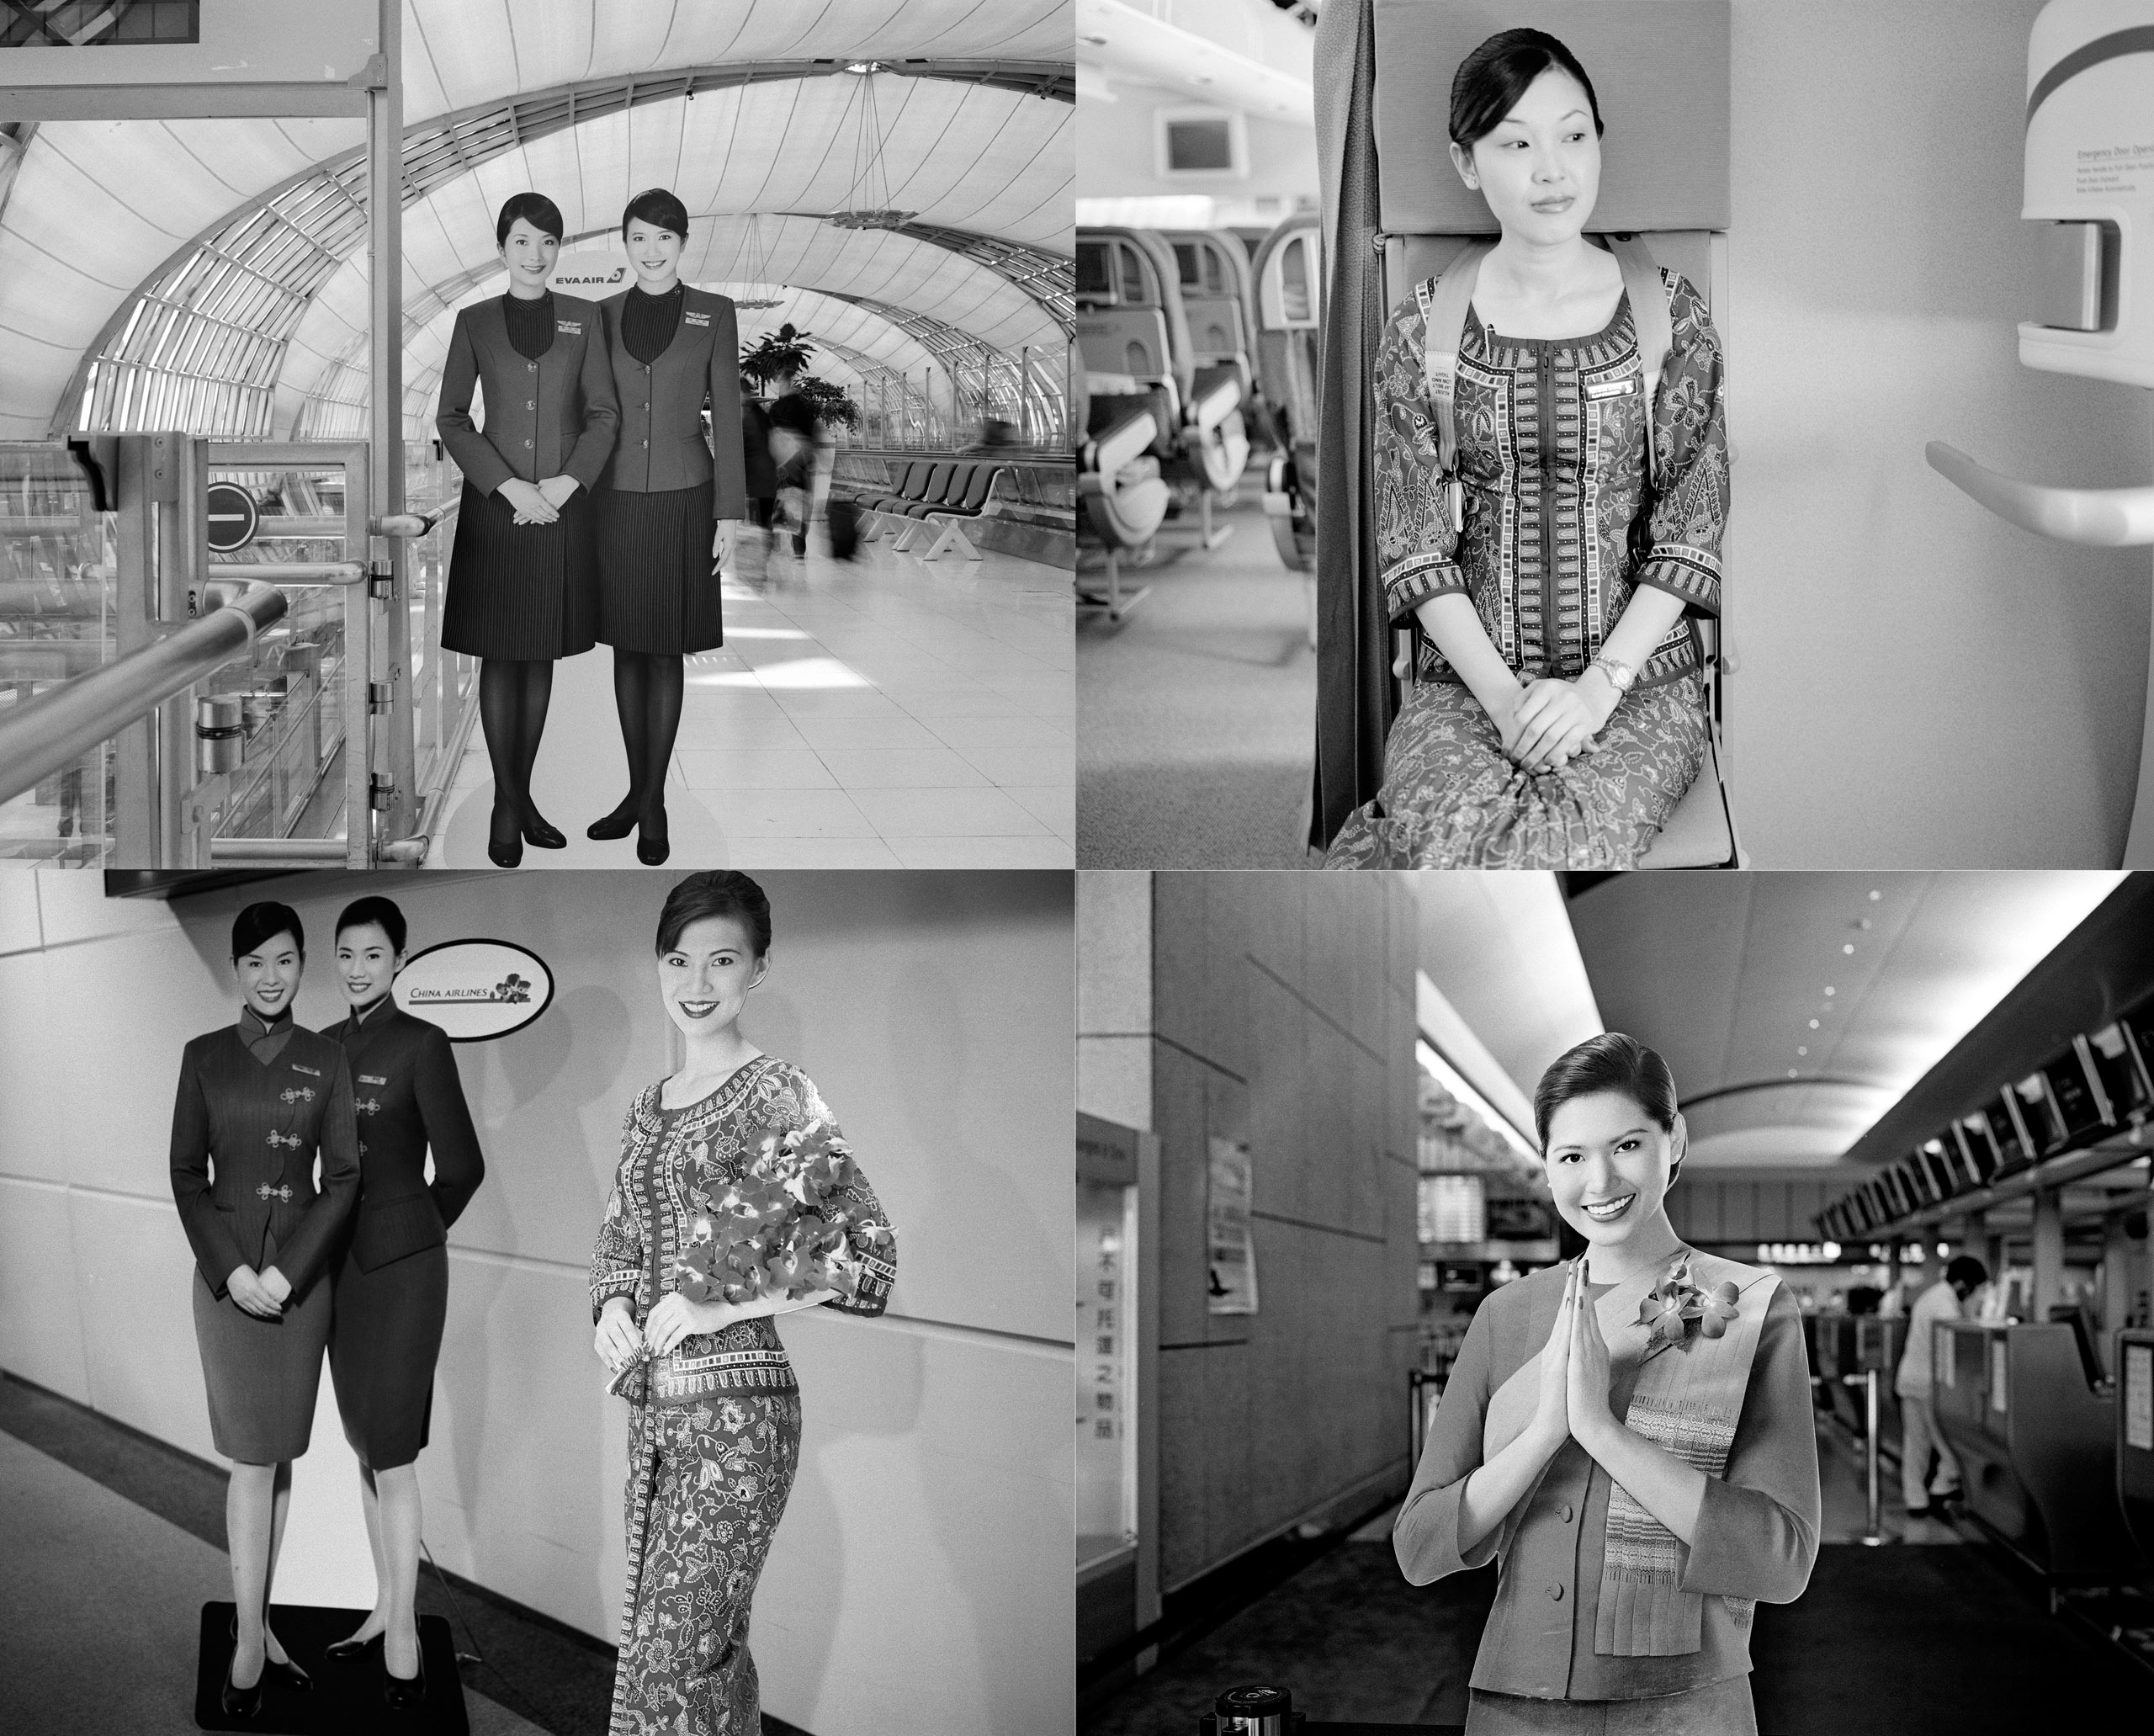 (From top-left to bottom-right)                                                               Suvamabhumi Airport,  Bangkok, Thailand, 2012.                                                              Singapore Airlines flight attendant, Singapore, 2007.                                                               Taoyuan Airport,Taiwan,  2006.                                                              Taoyuan International Airport, Taiwan, 2009